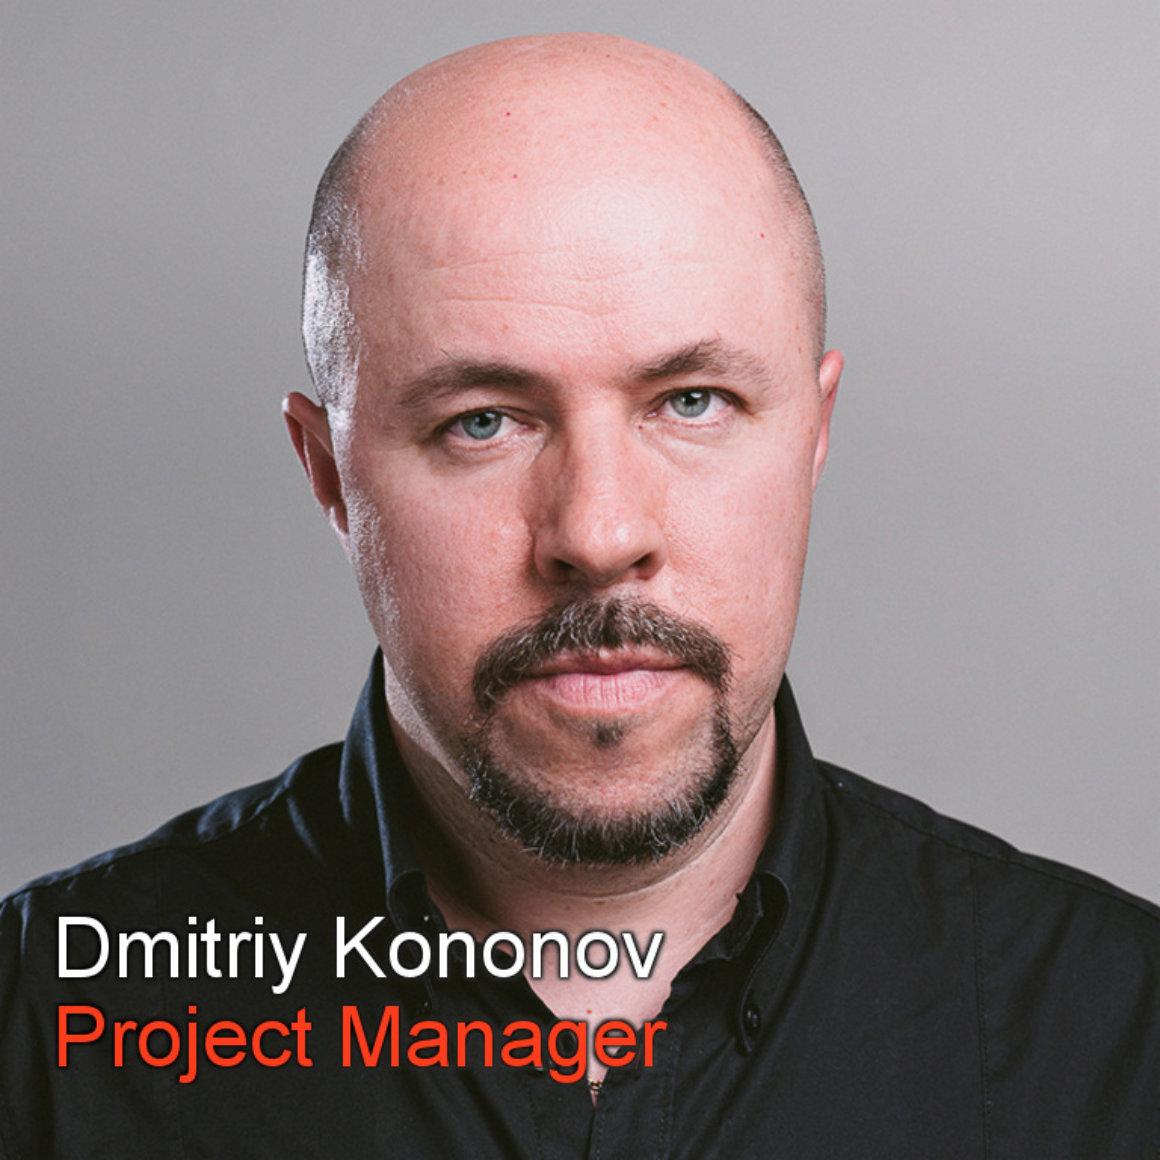 Dmitriy Kononov BW